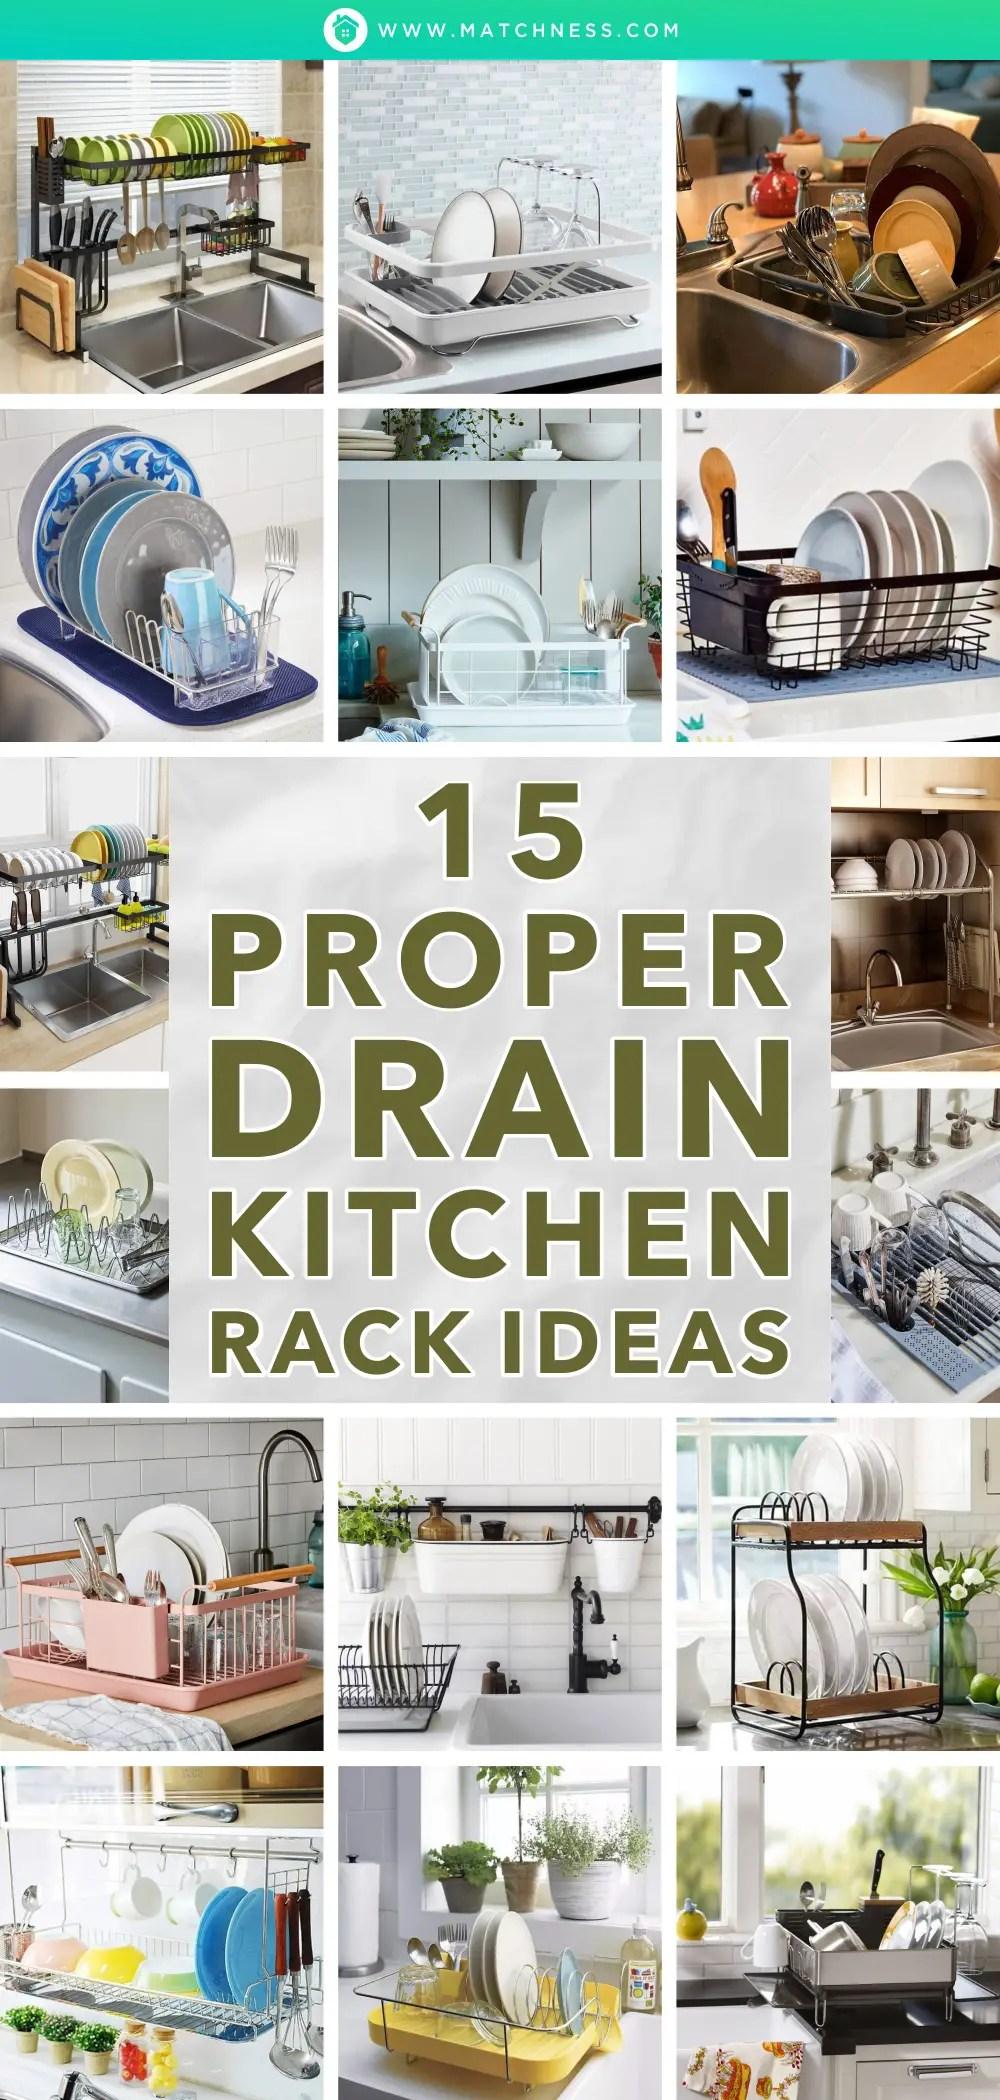 15-proper-drain-kitchen-rack-ideas1